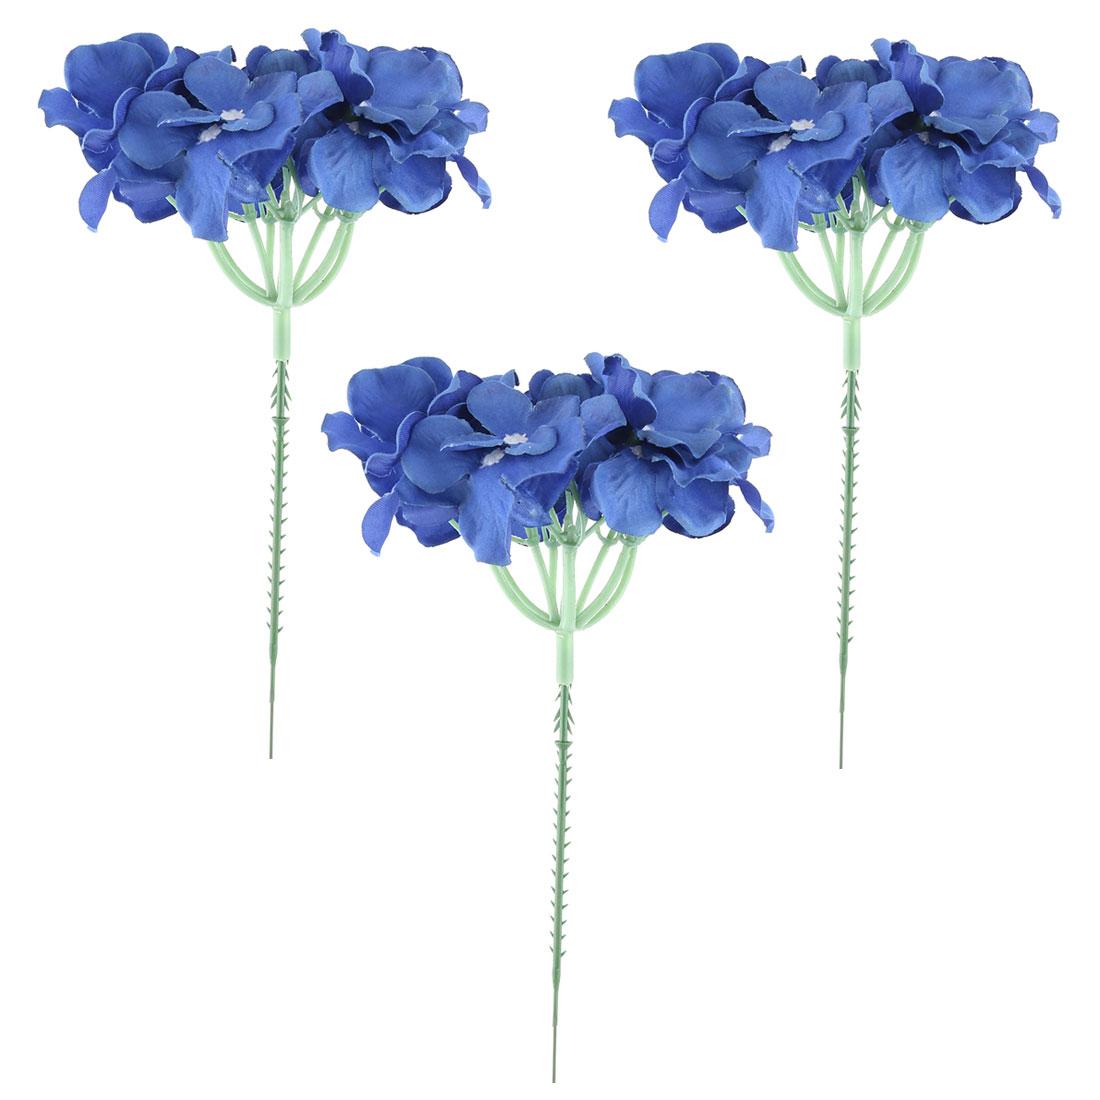 Wedding Fabric Artificial Flower Head Decorative Petals Craft Royal Blue 3pcs